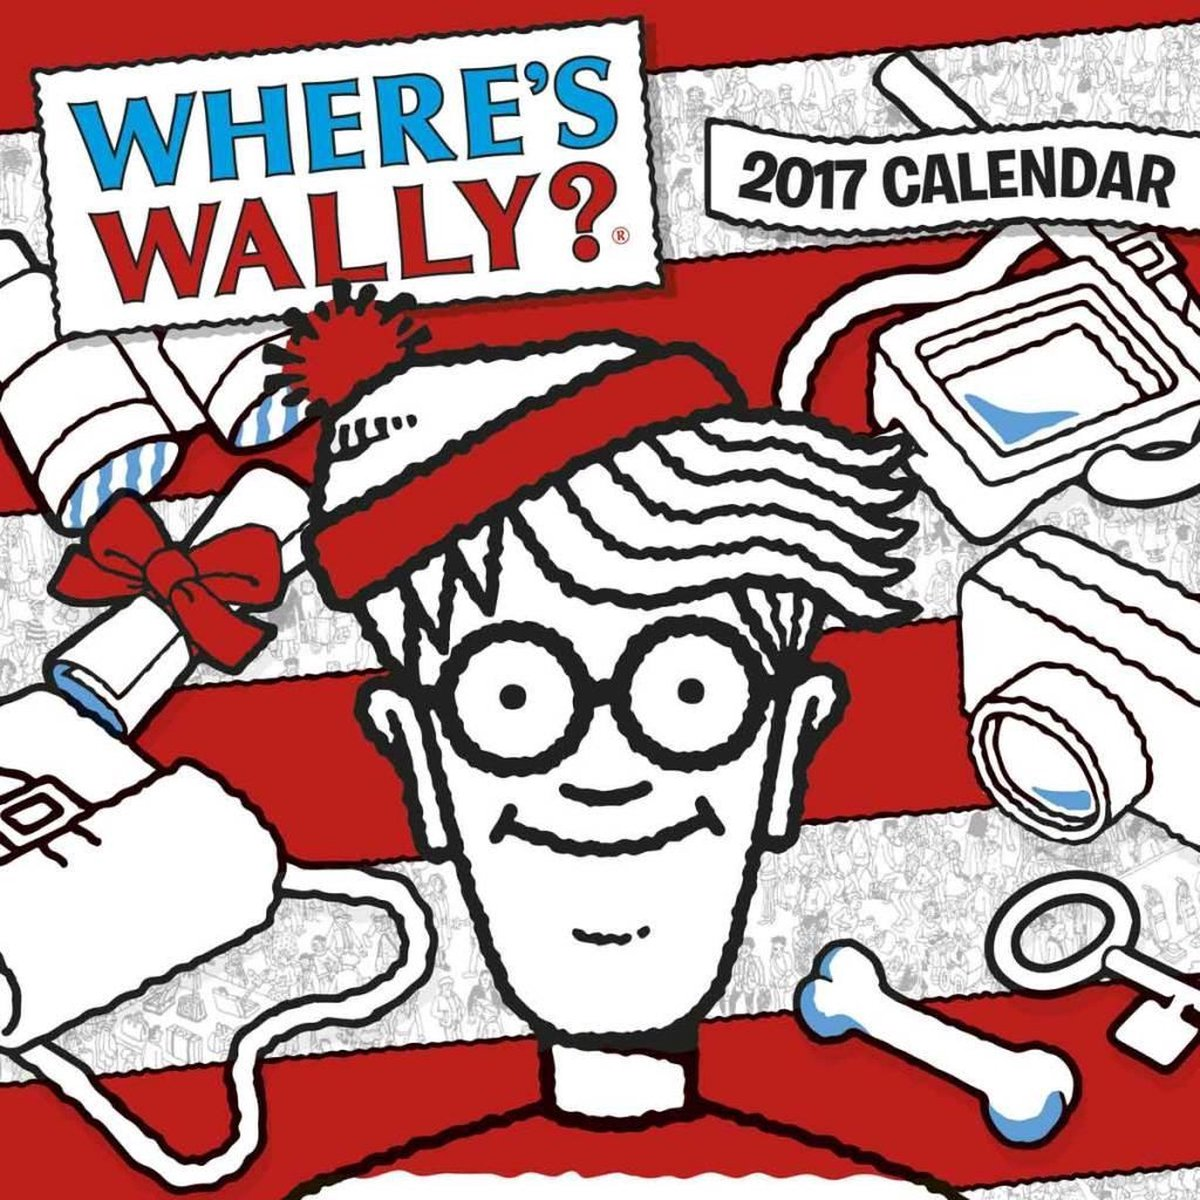 Where's Wally Kalender 2017 Carousel - Kalenderwereld